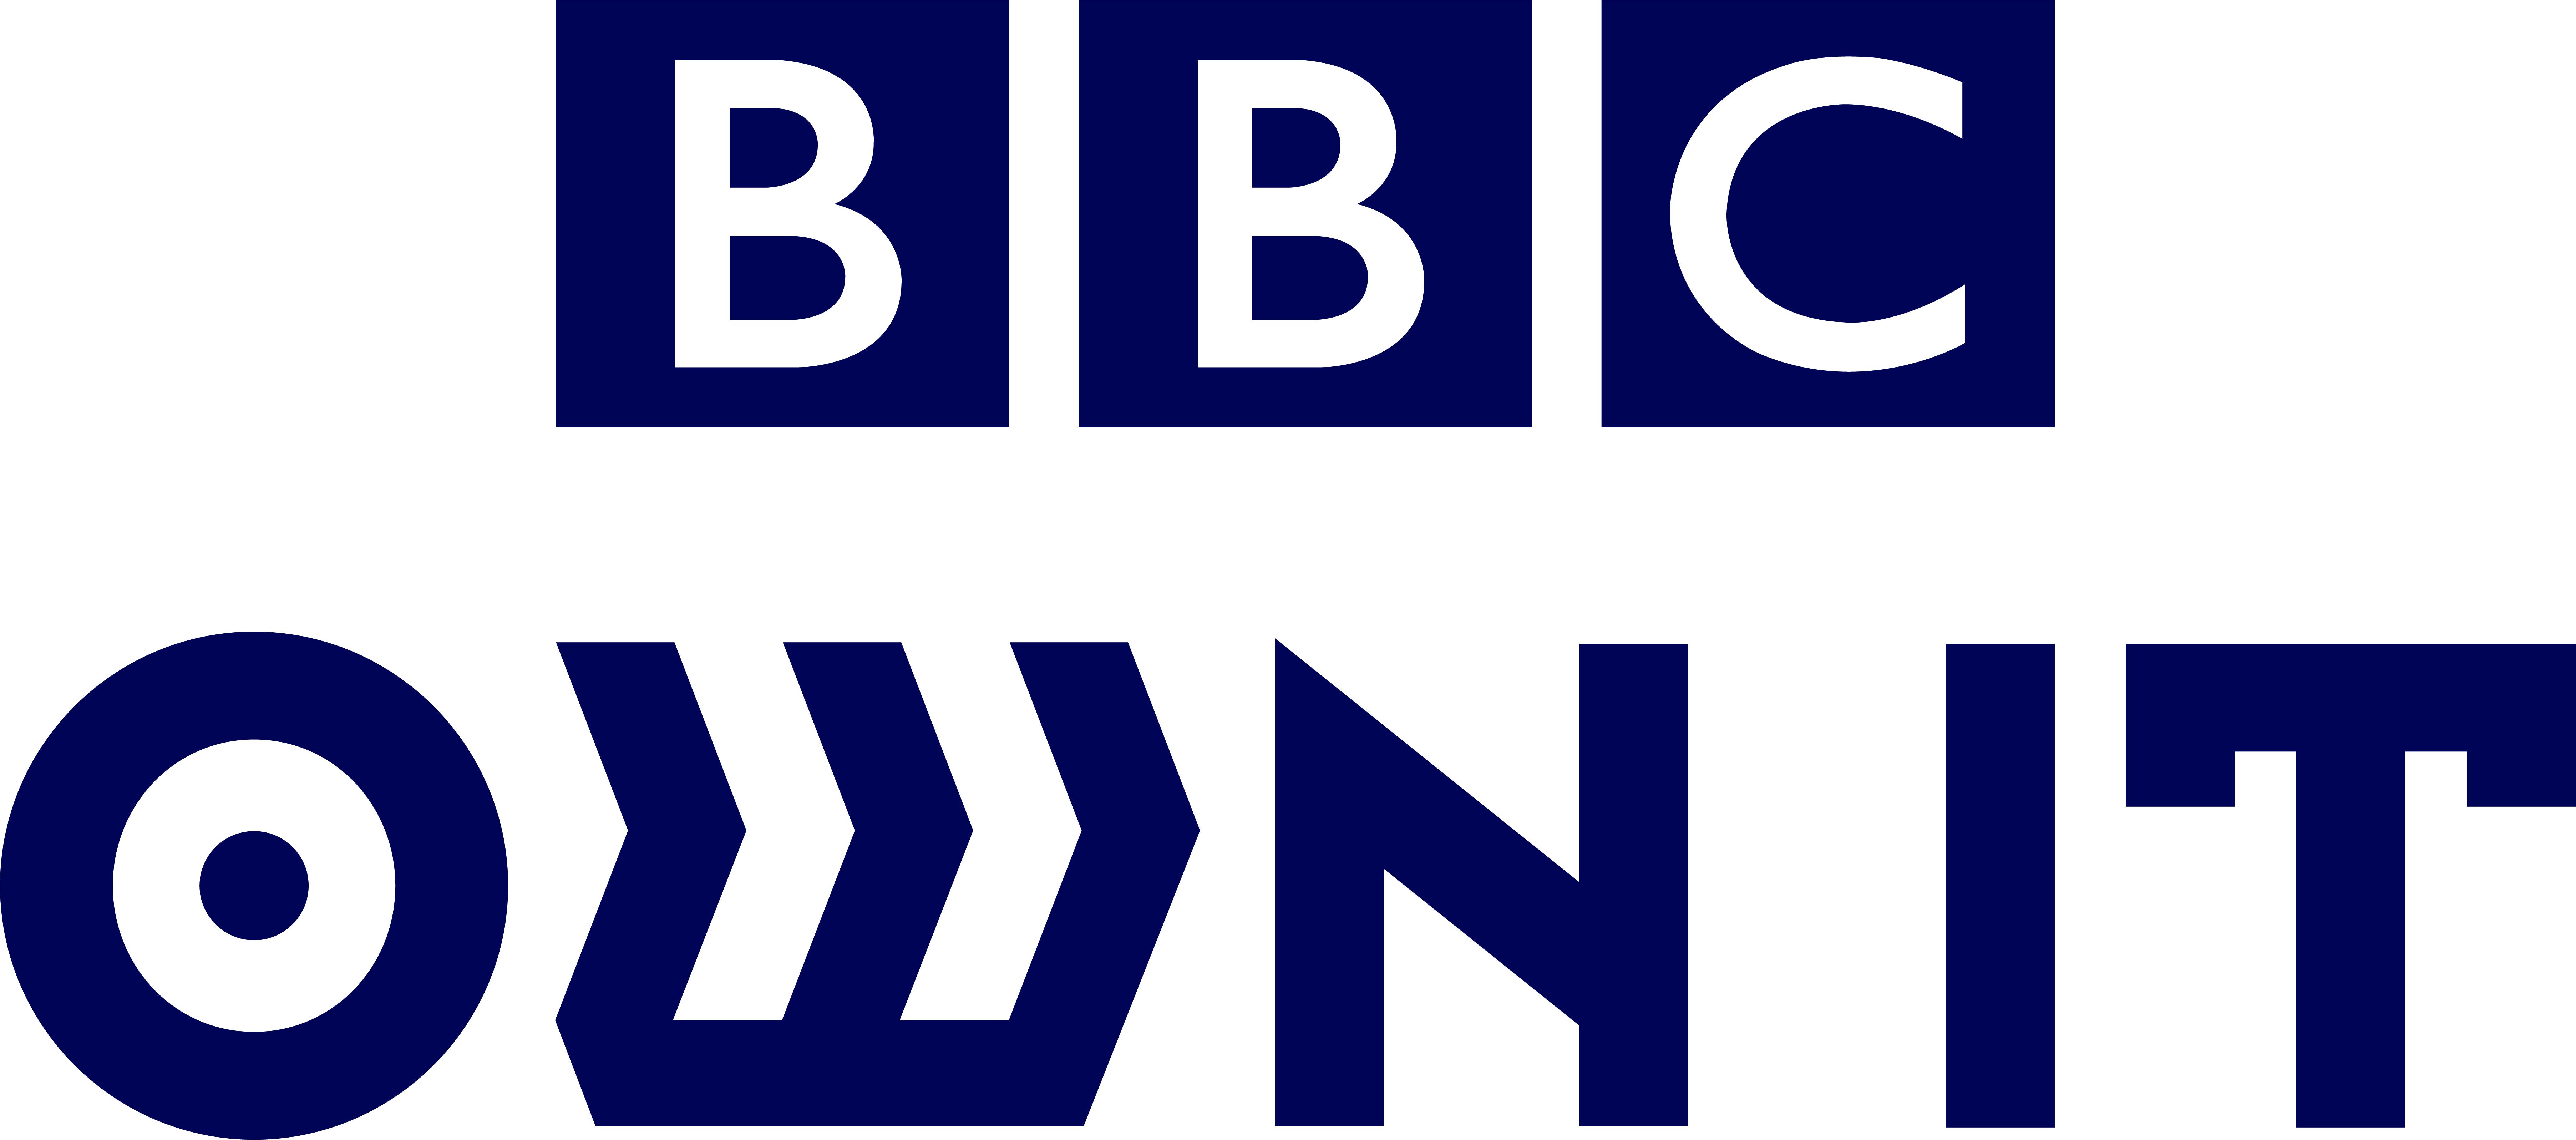 bbc own it.jpg